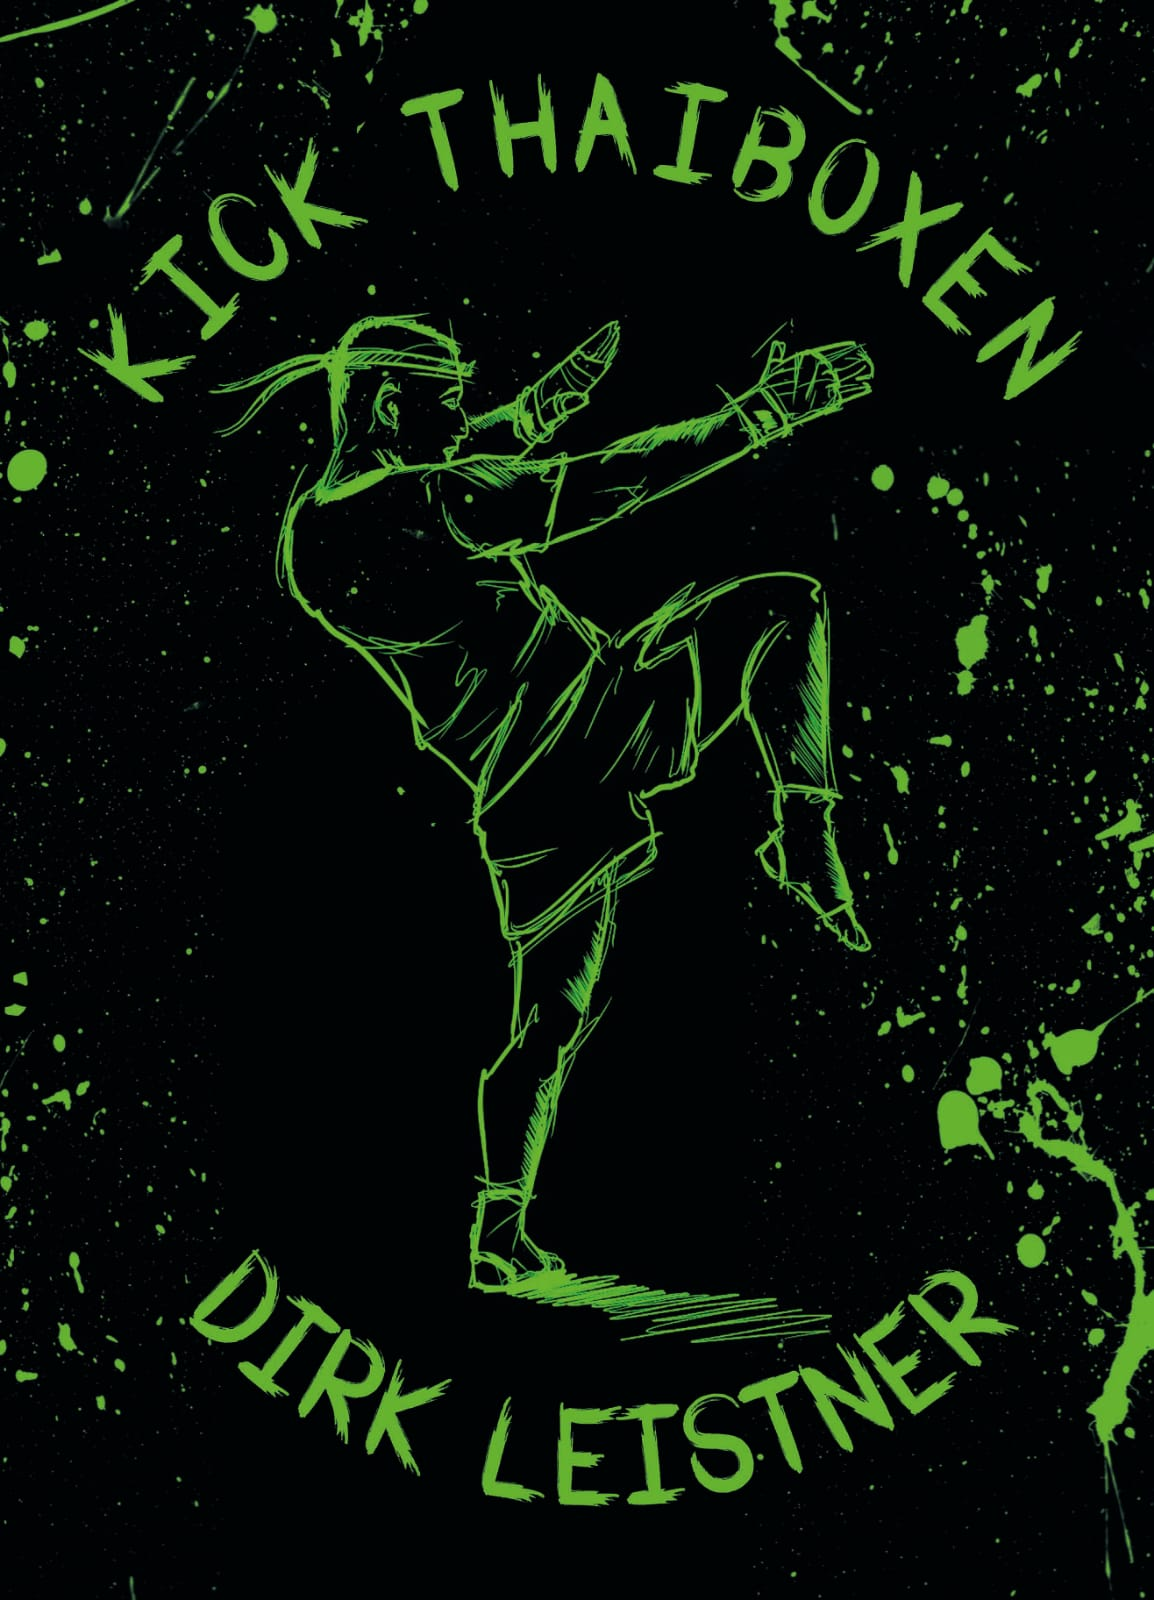 Kick-Thaiboxen Dirk Leistner